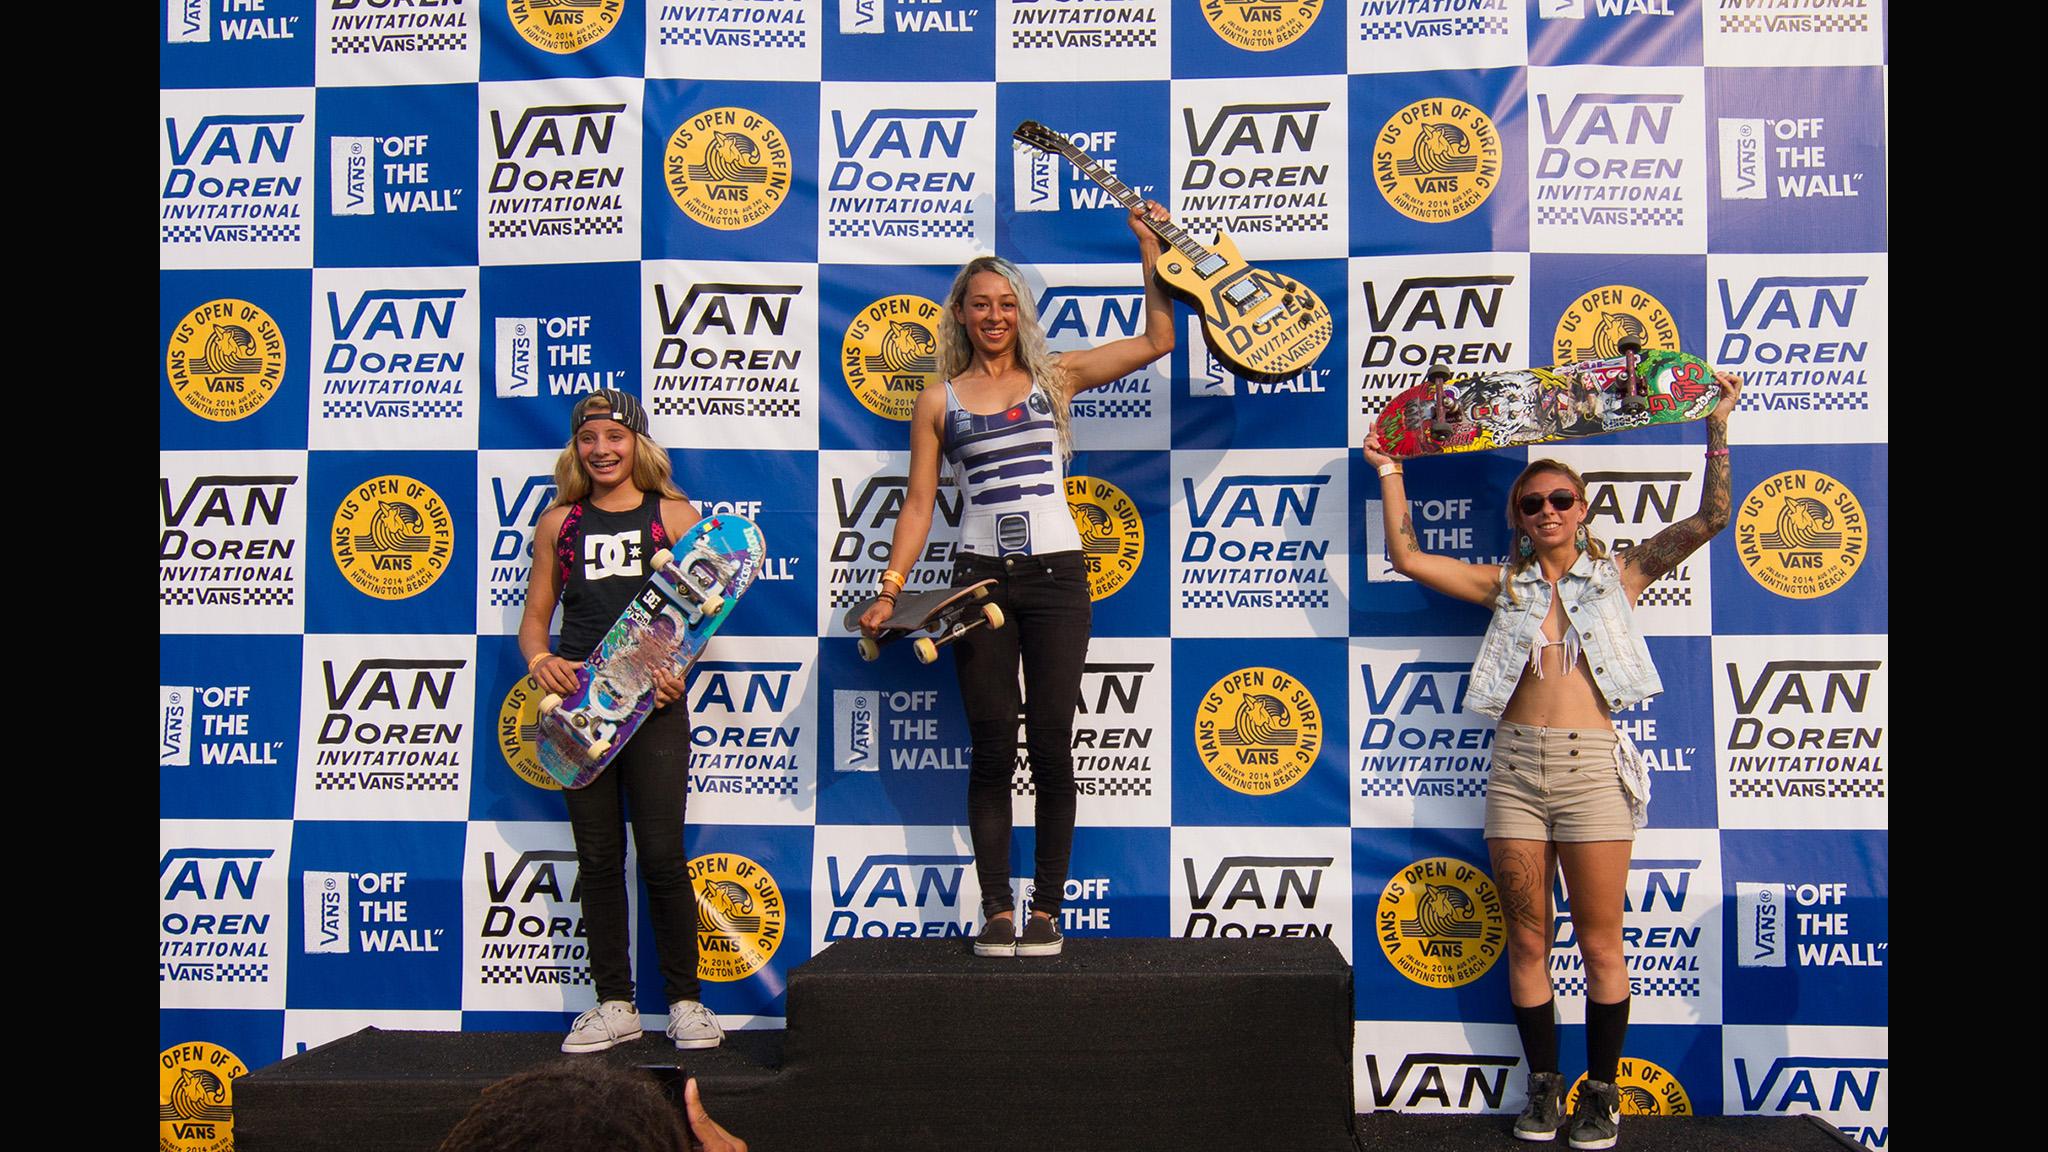 Women's podium